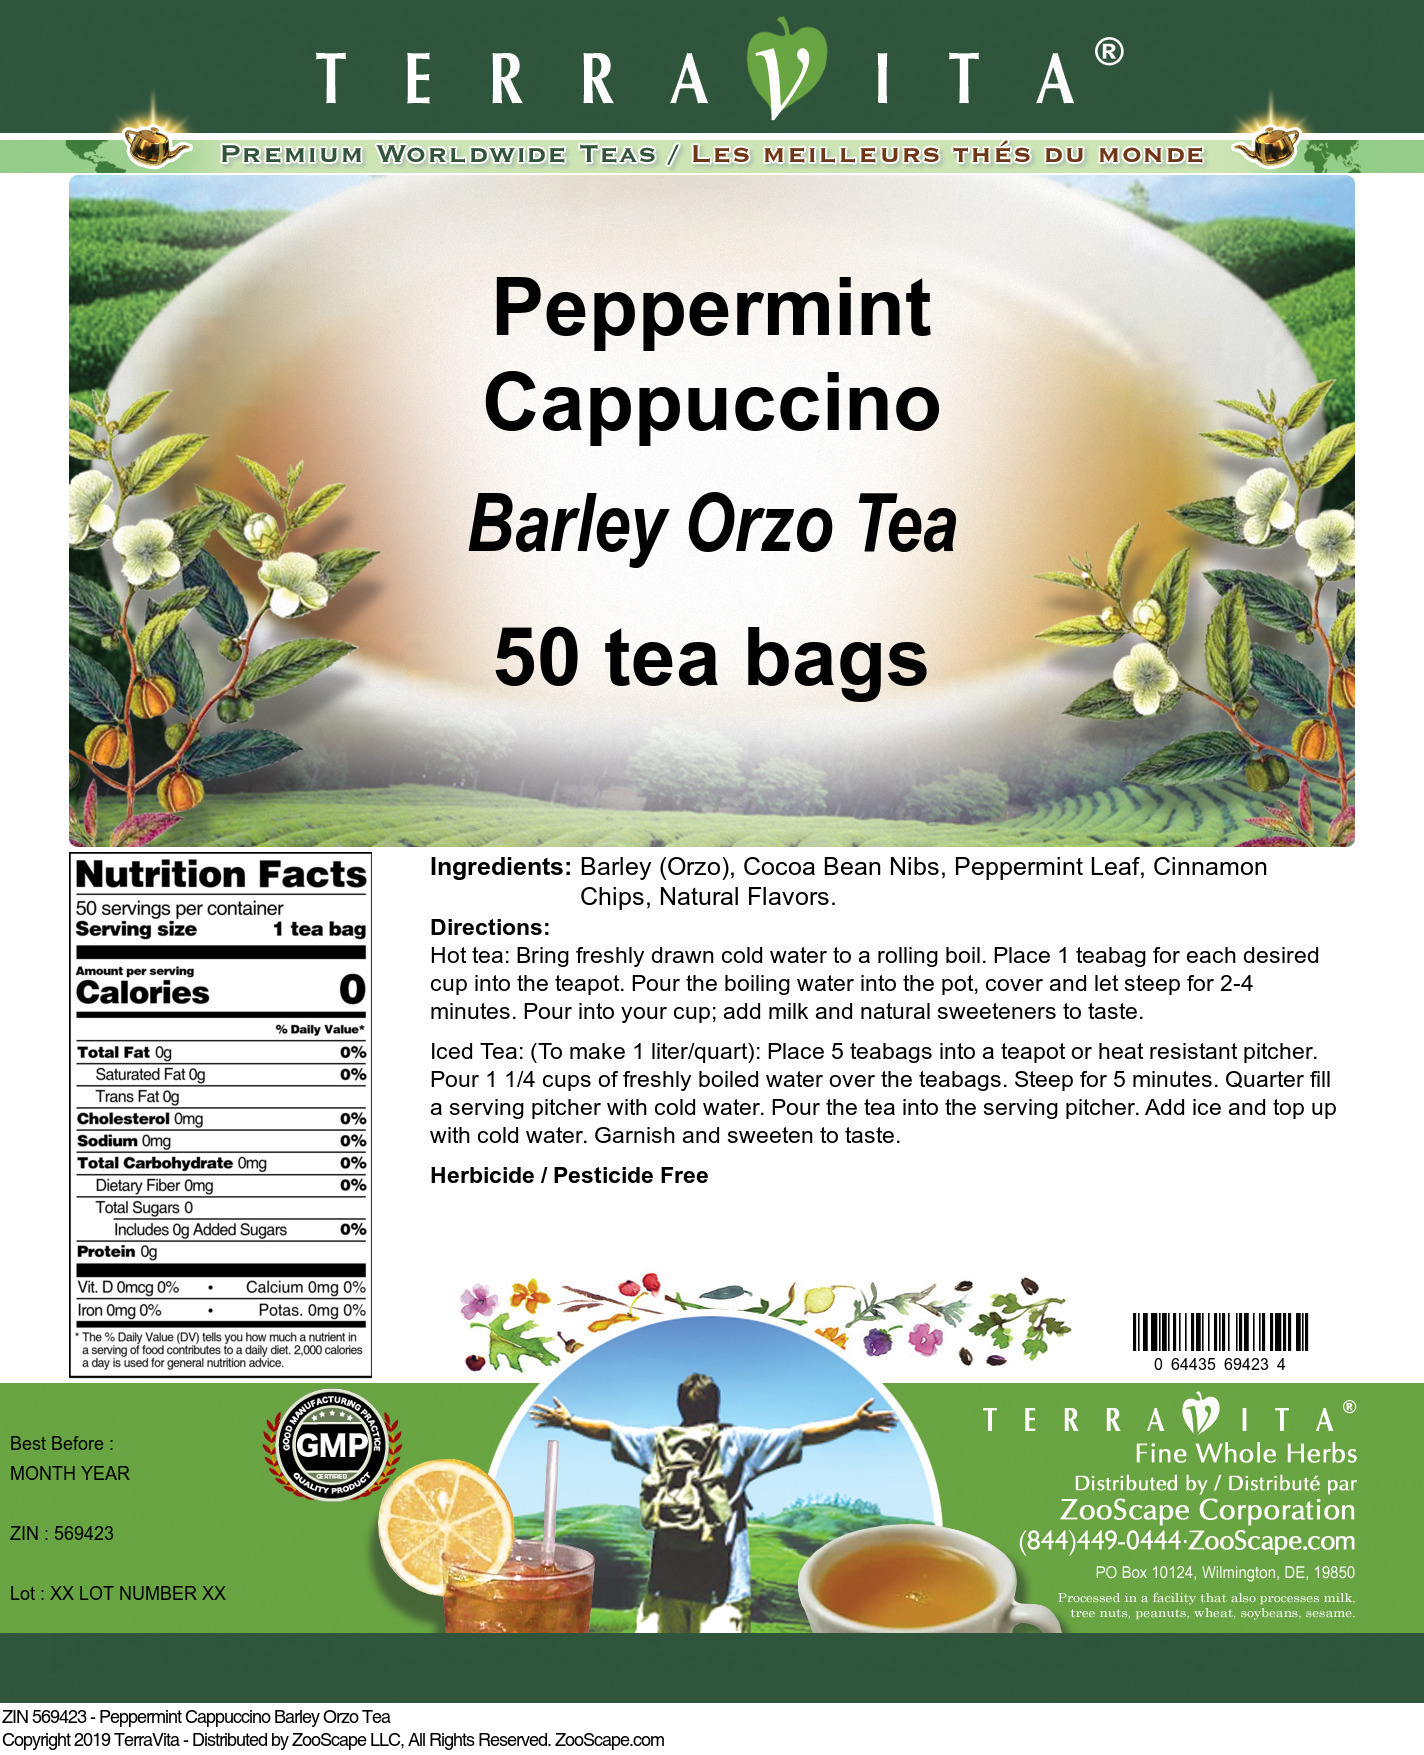 Peppermint Cappuccino Barley Orzo